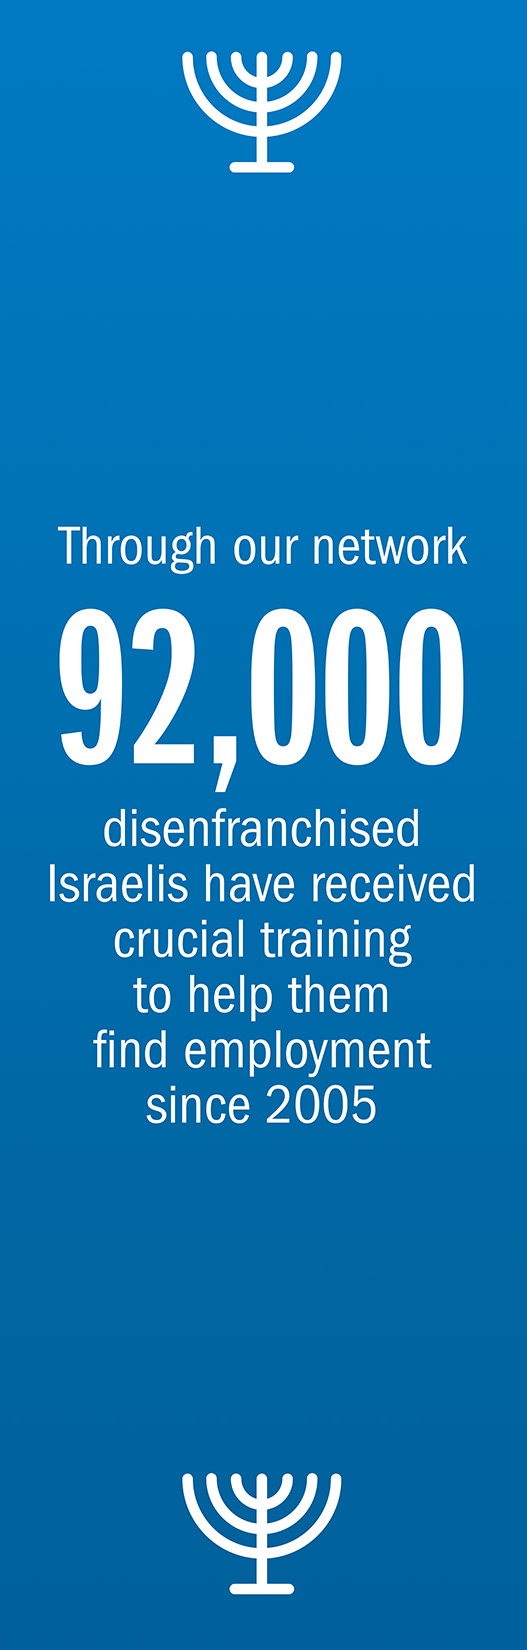 UJA Israeli Society Banner rev06 Side B.jpg